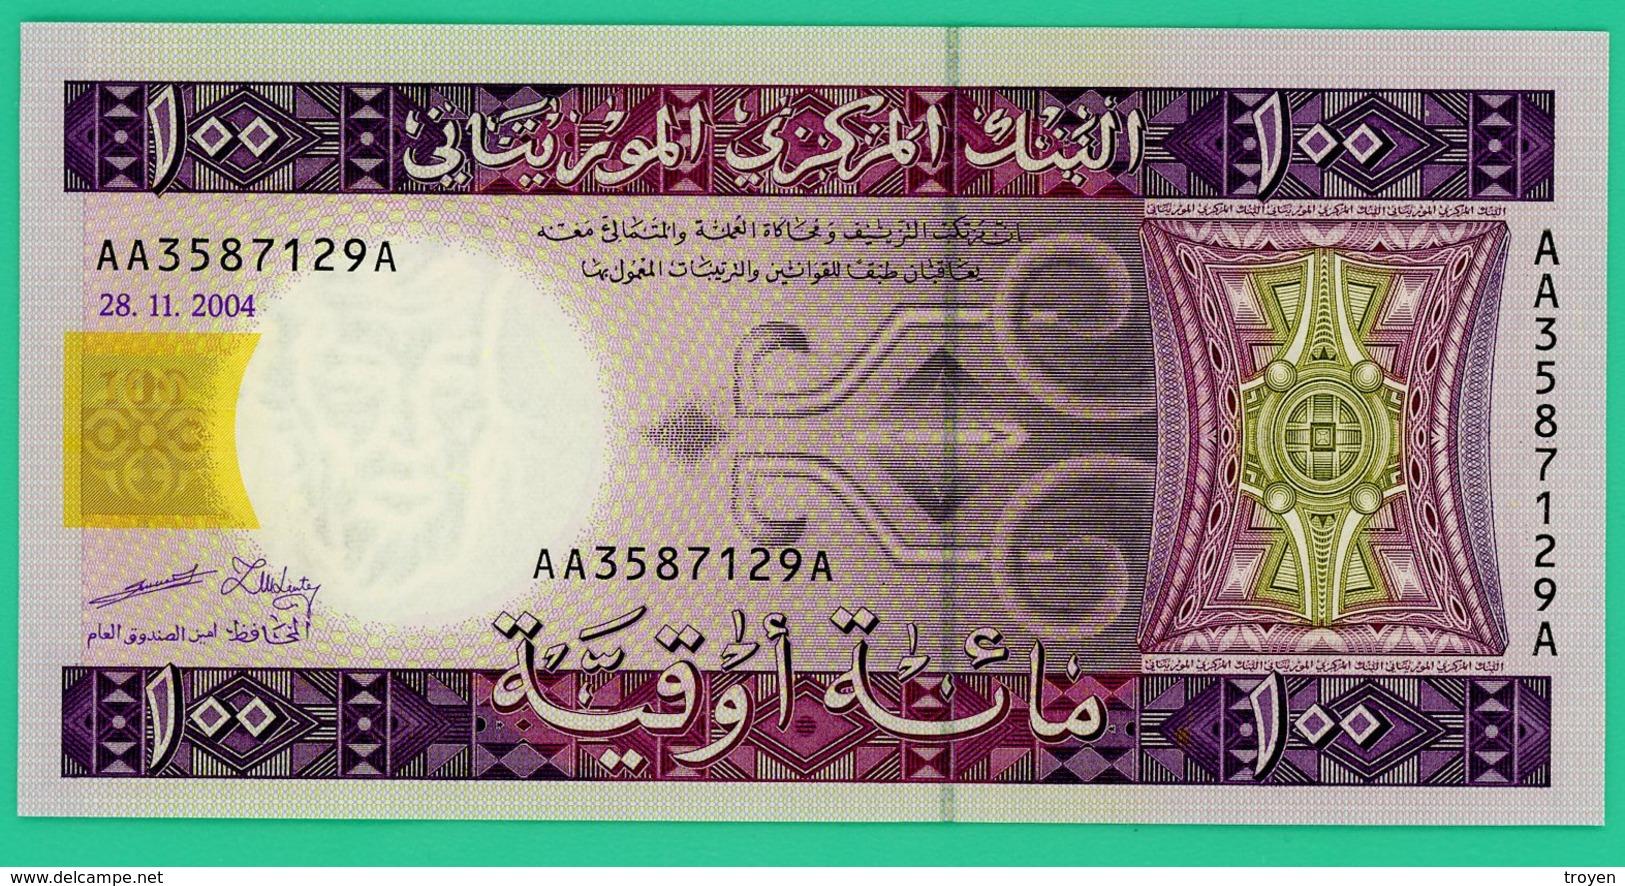 100 Ouguiya - Mauritanie - 2004 - N° AA3587129A -  Neuf - - Mauritania